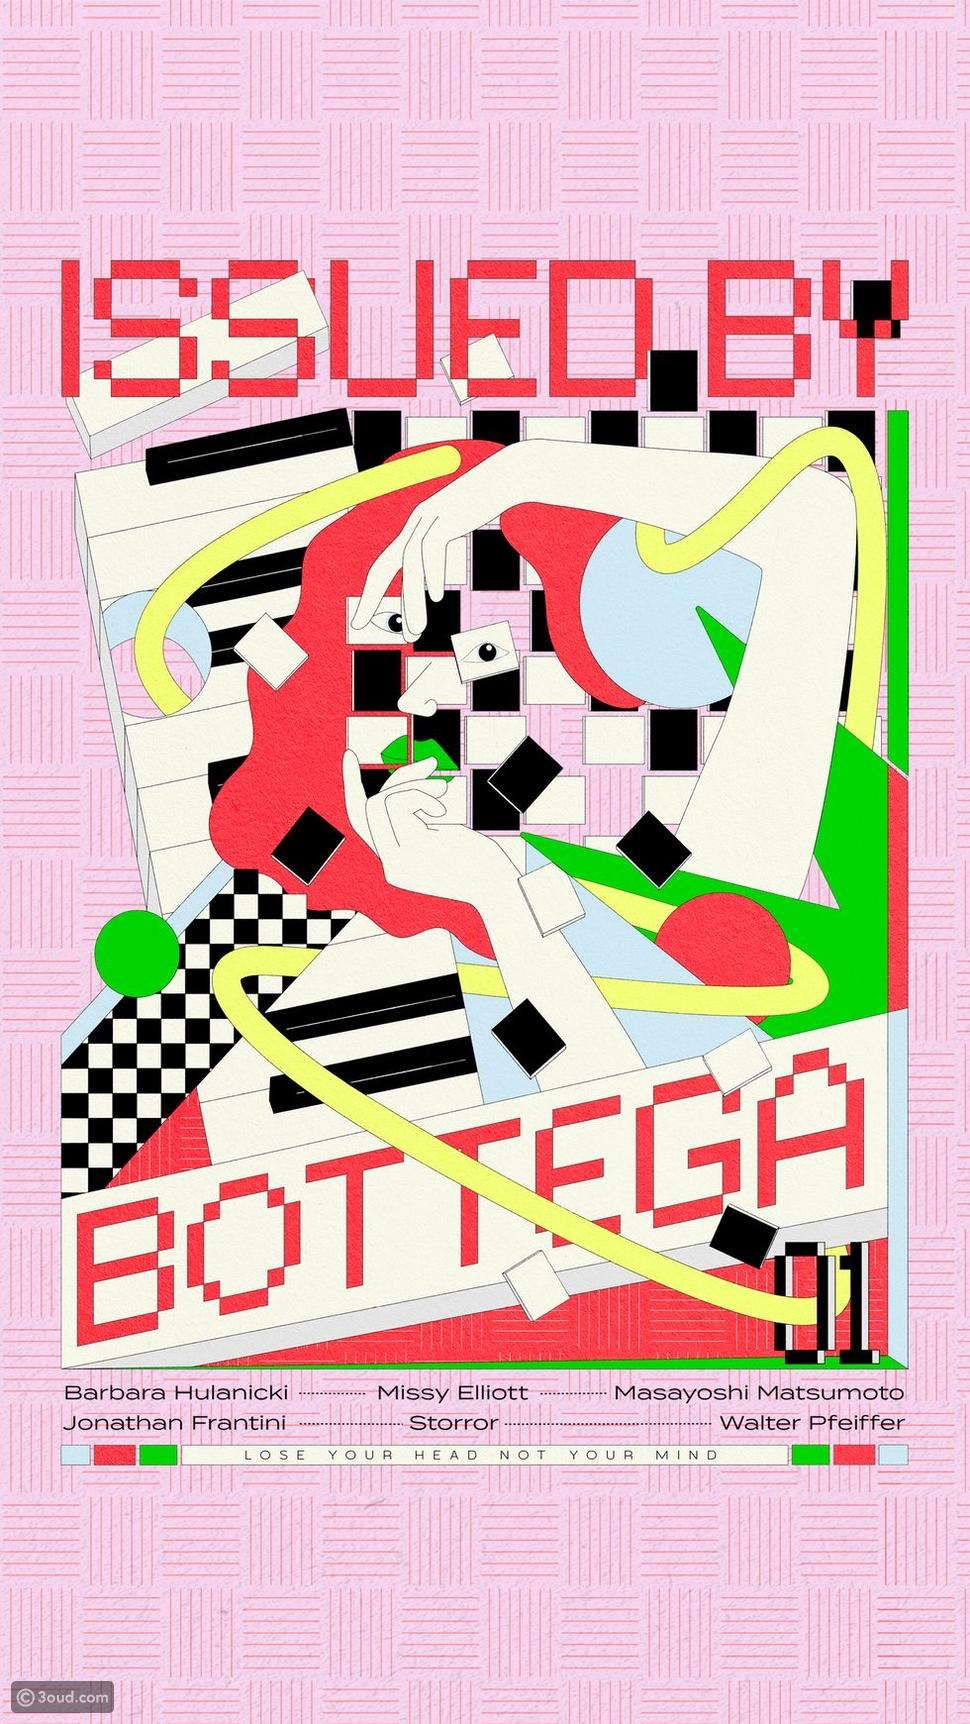 Bottega Veneta تعود للعالم الرقمي بعد اختفاء 3 أشهر!